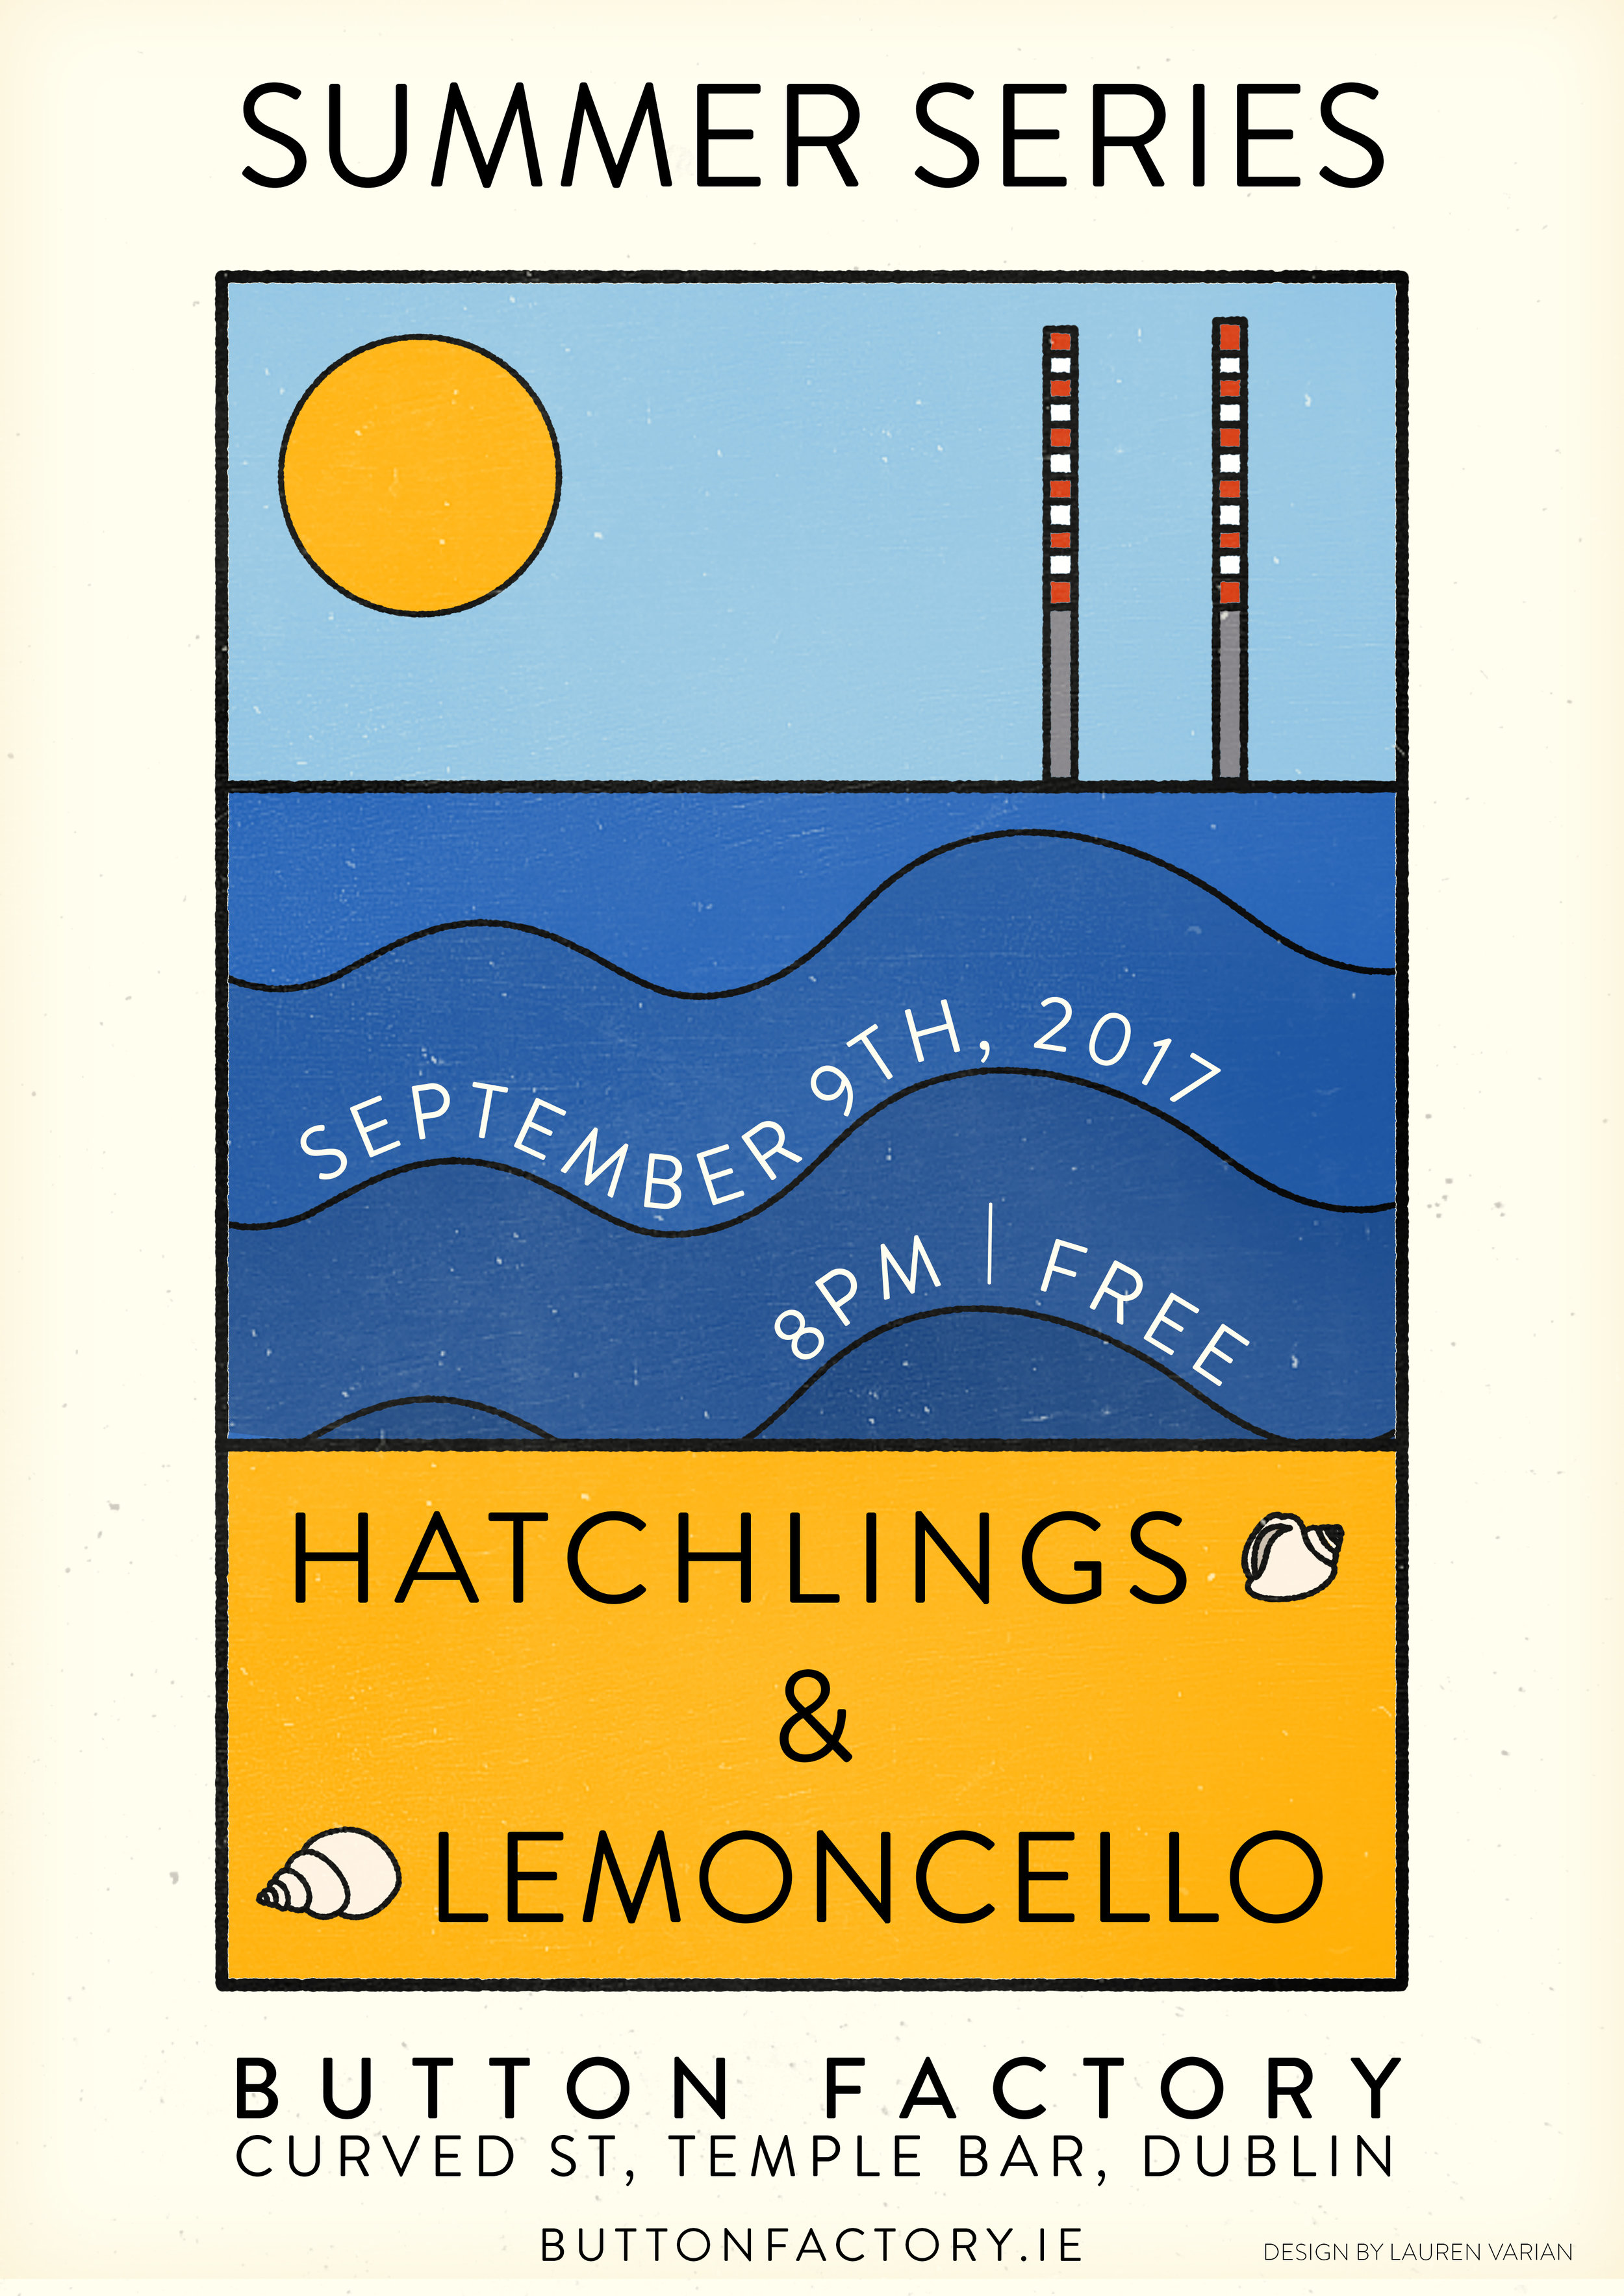 Summer Series Poster Design